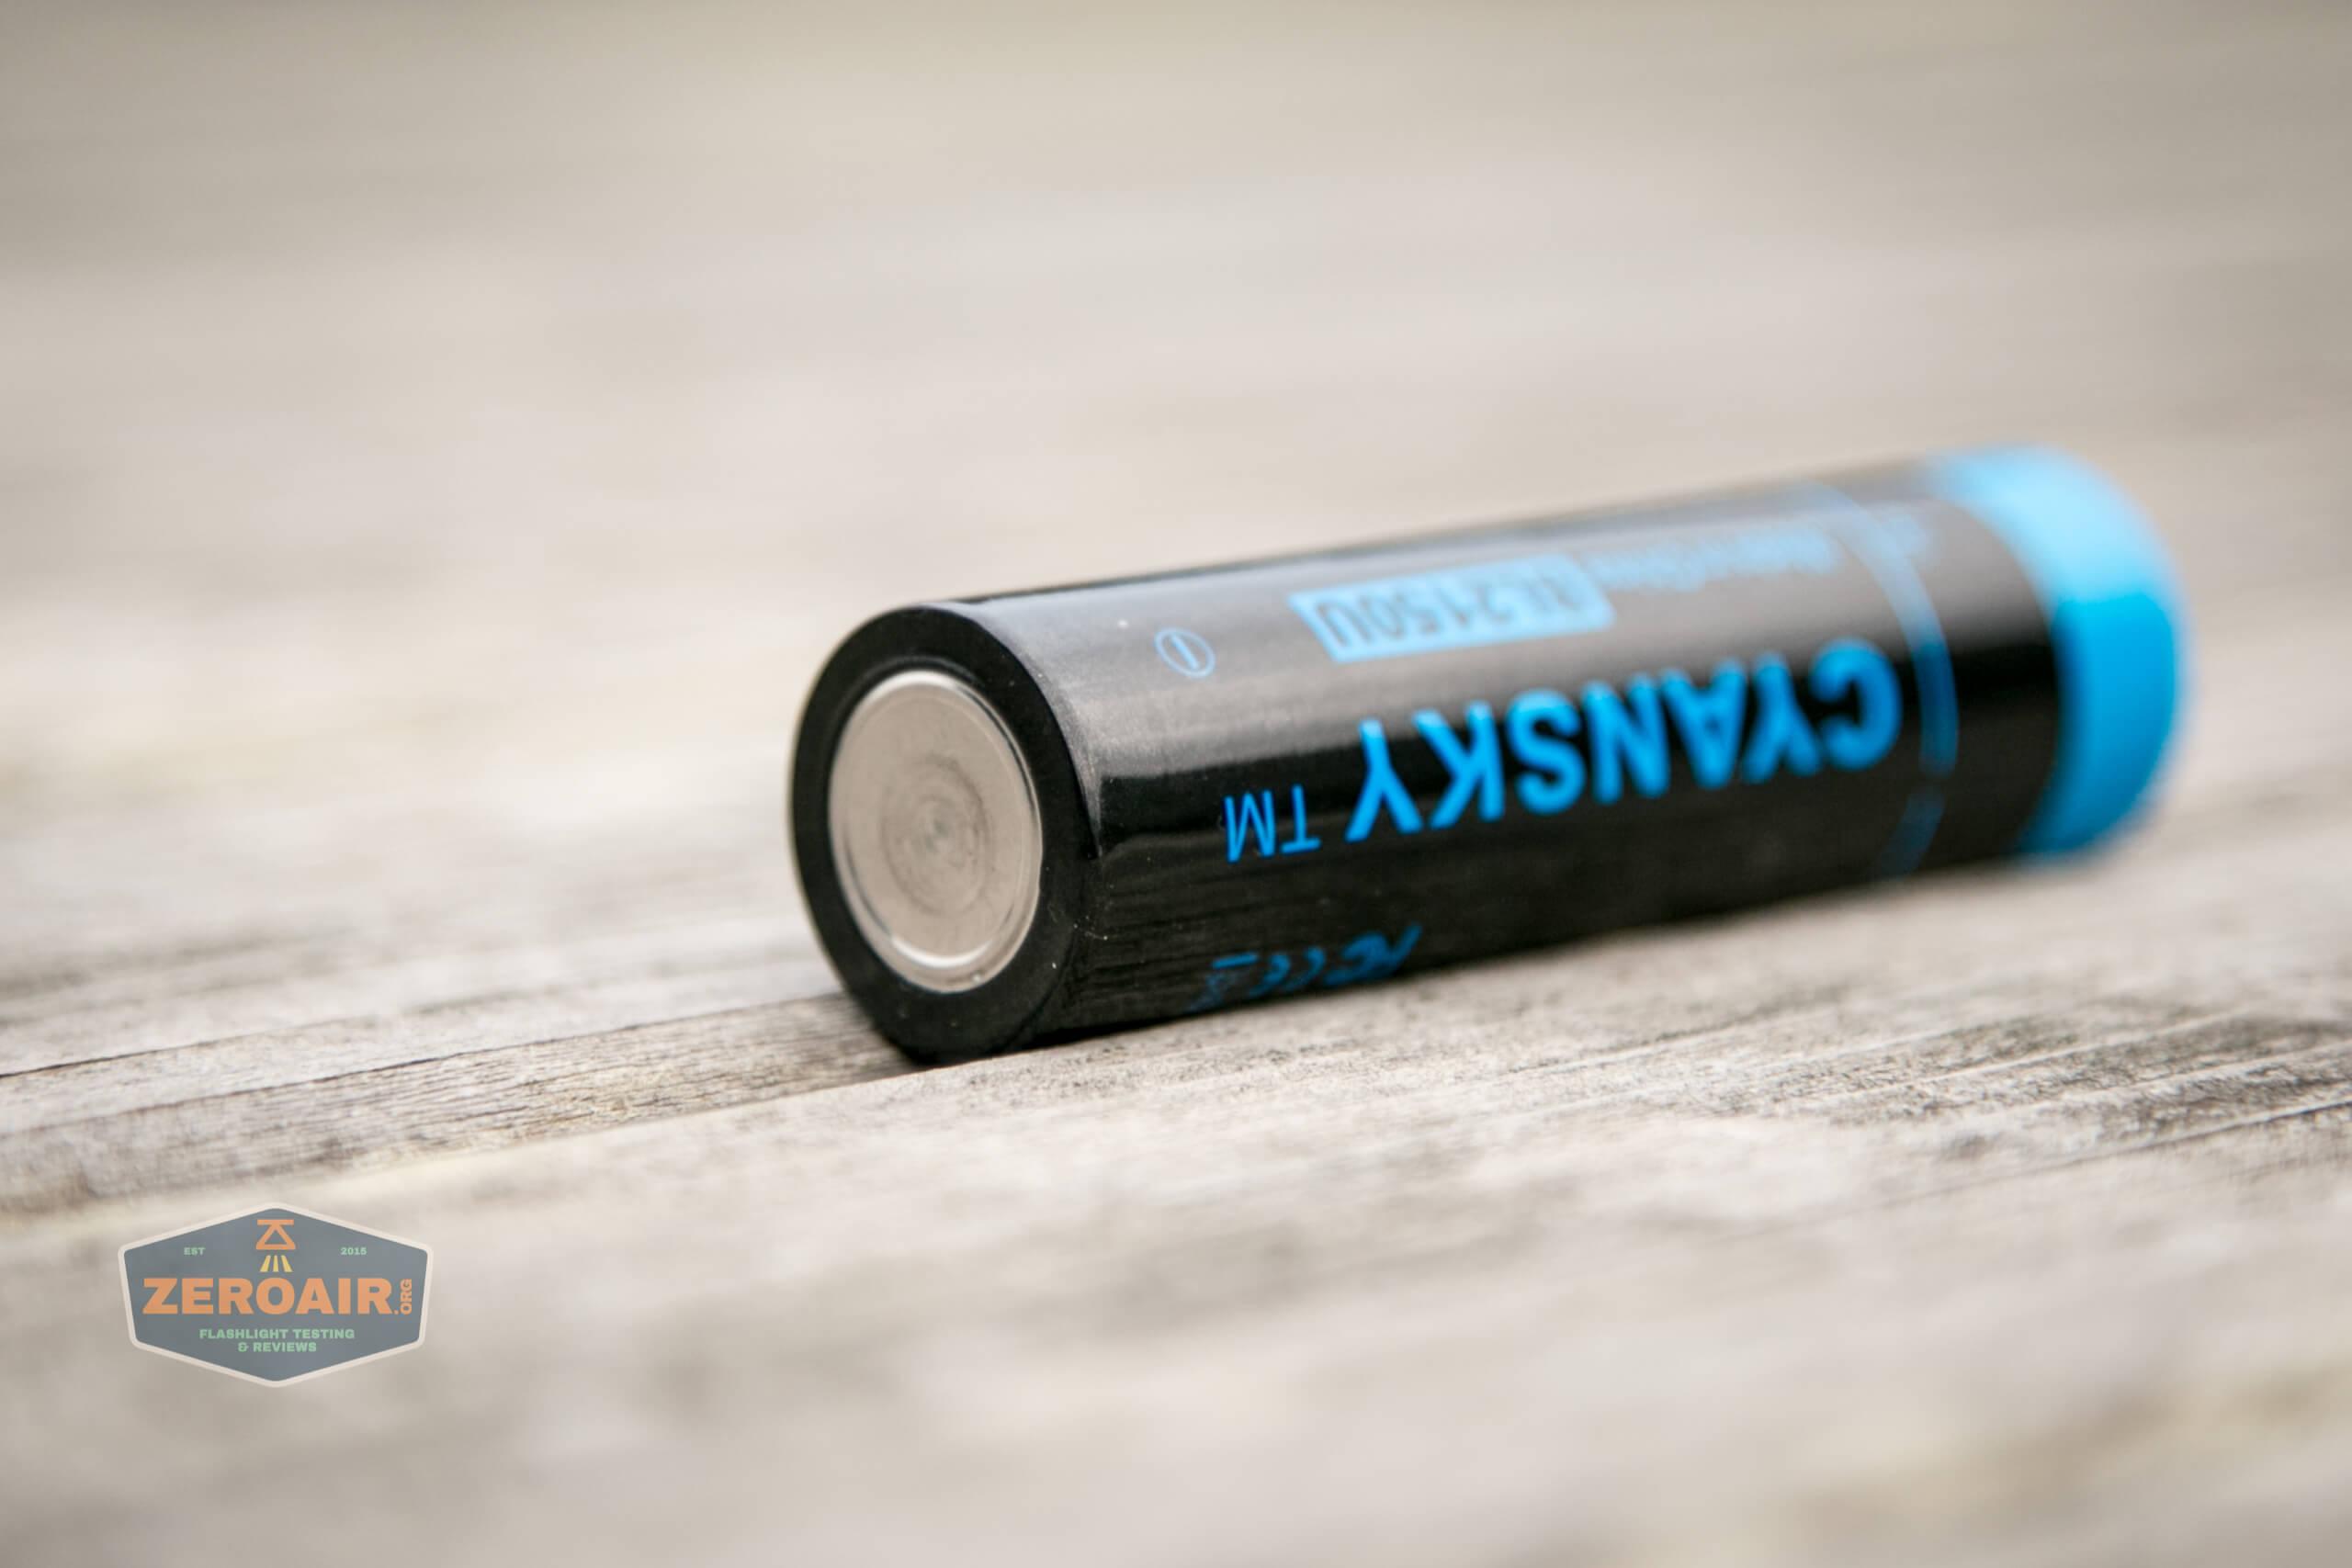 Cyansky P25 Flashlight included 5000mah 21700